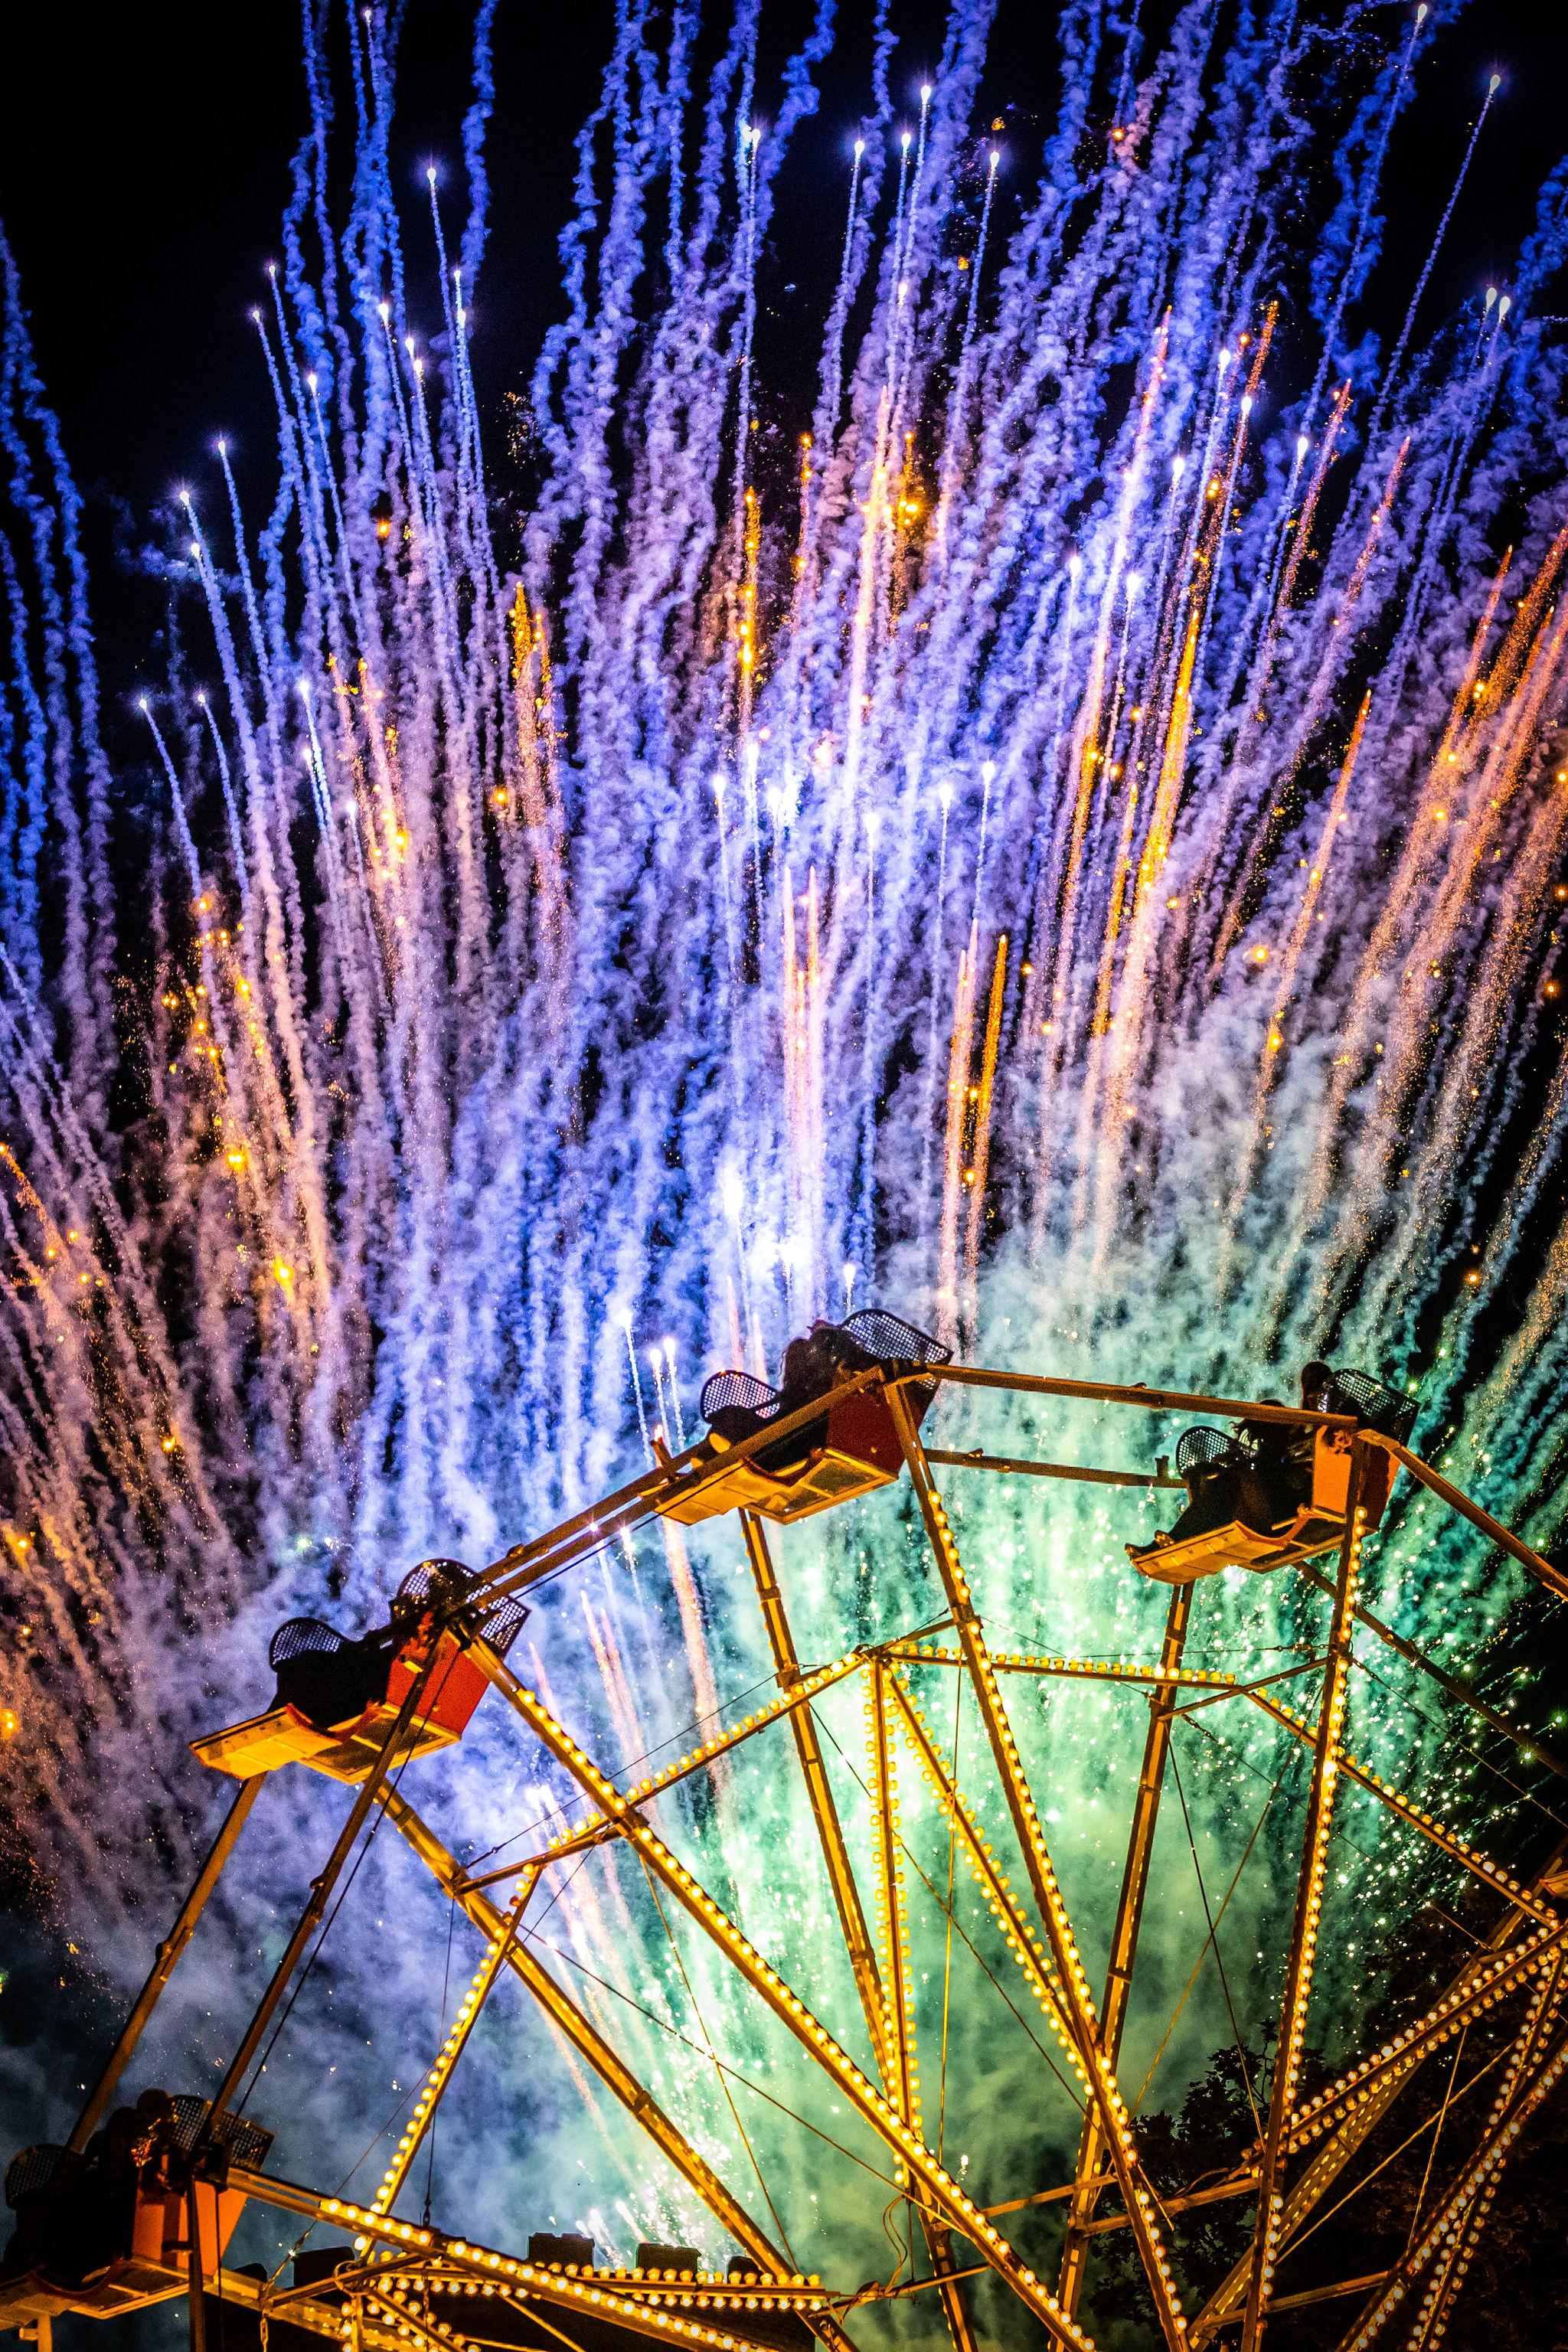 Sun_CastleStage_Fireworks_VF-5082.jpg